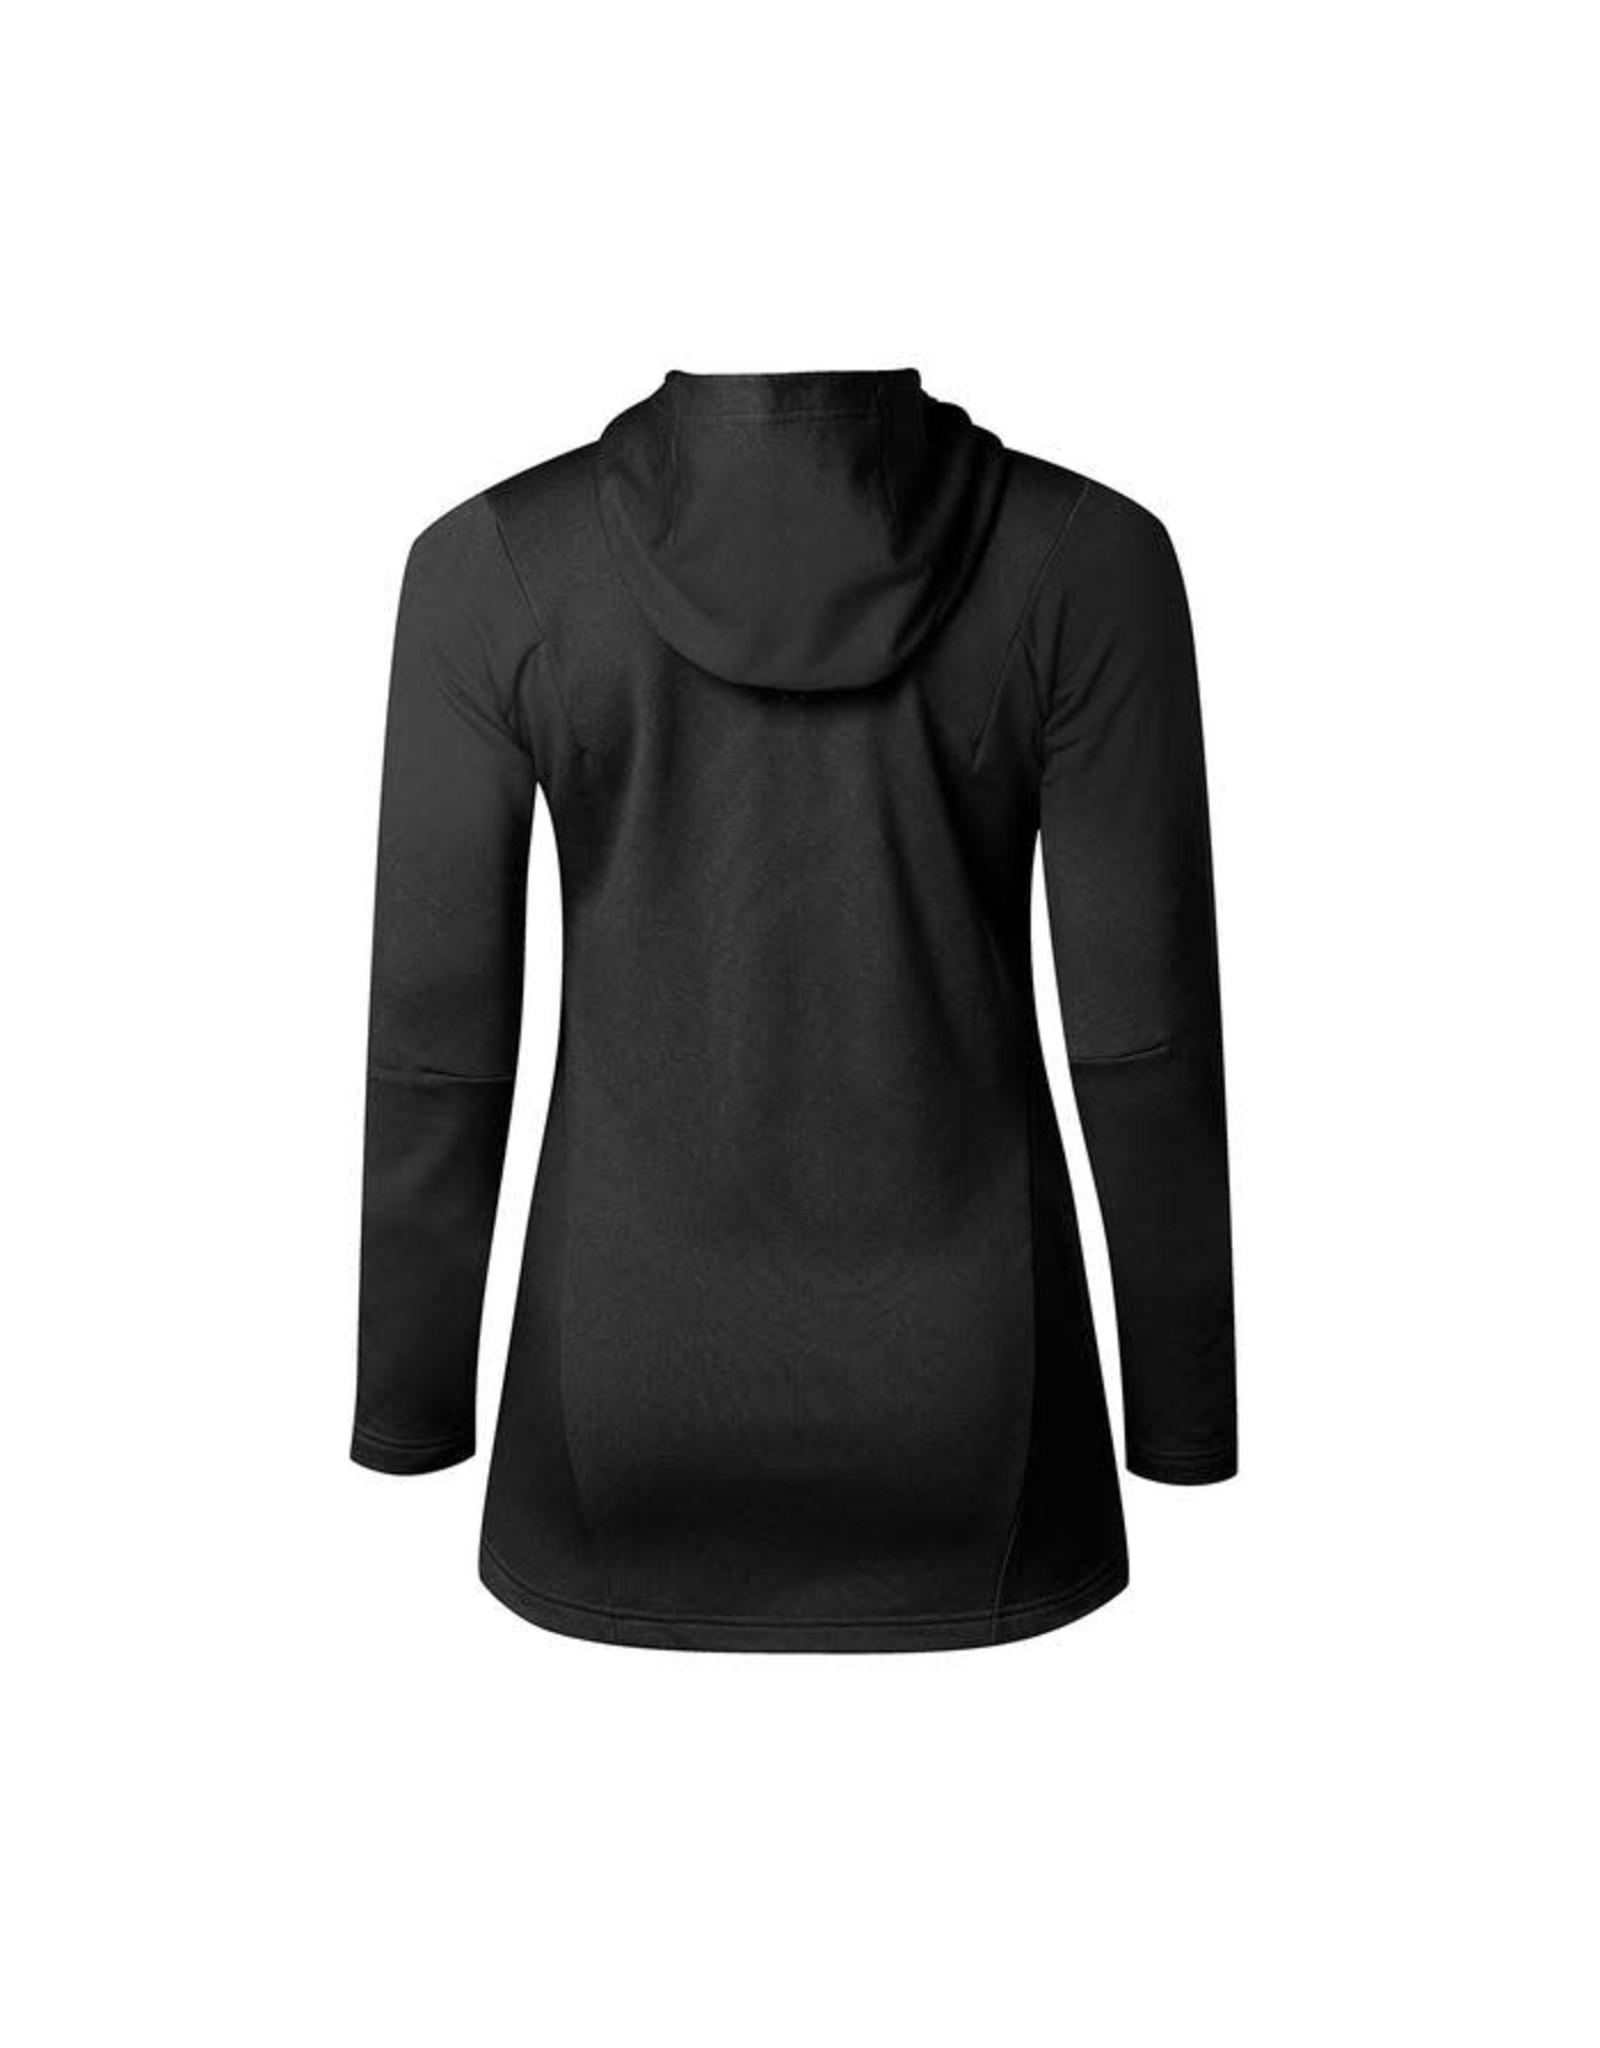 7MESH 7MESH - Apres Hoody Women's XL